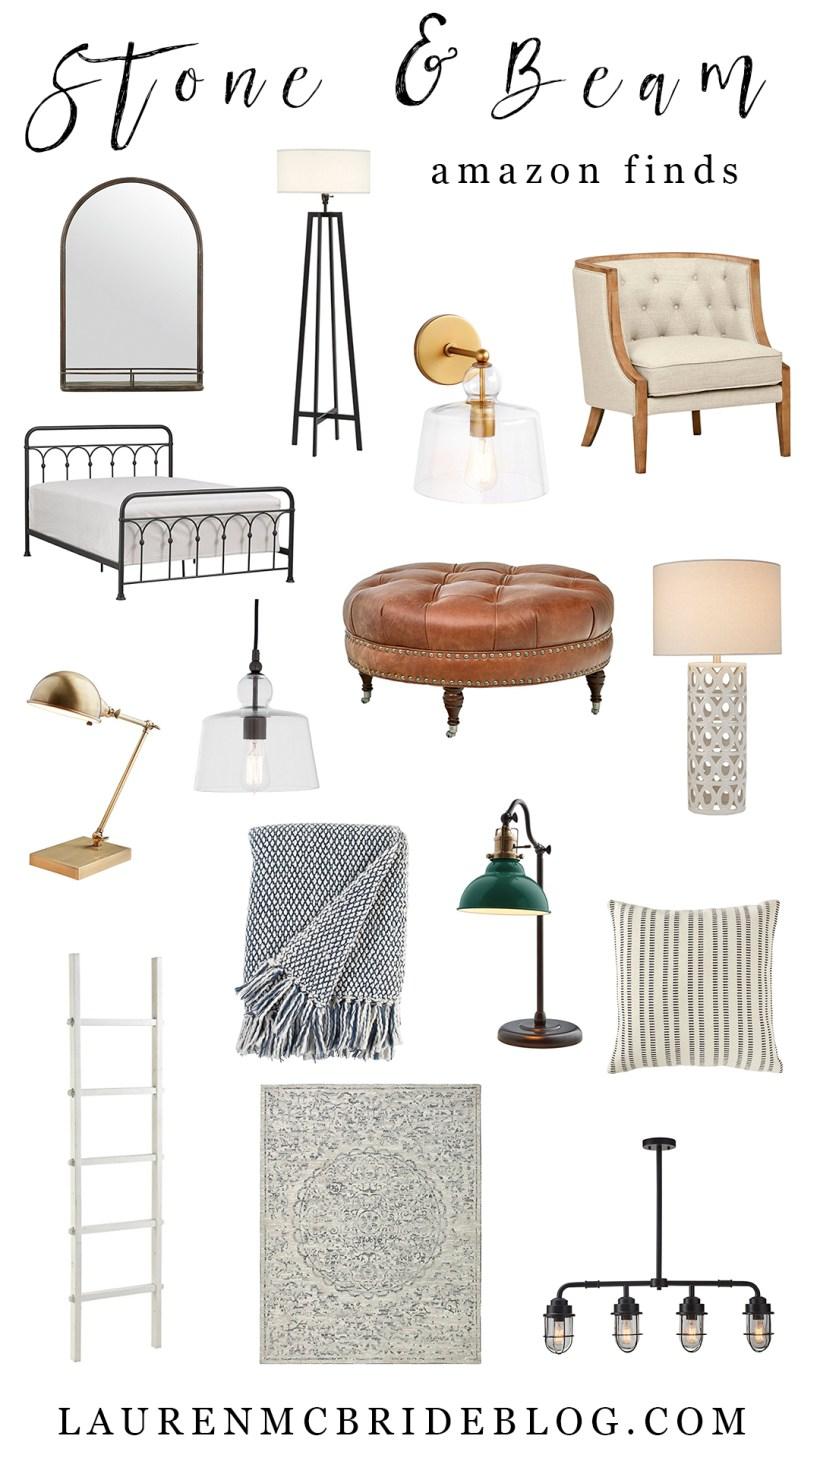 stone beam amazon finds lauren mcbride. Black Bedroom Furniture Sets. Home Design Ideas